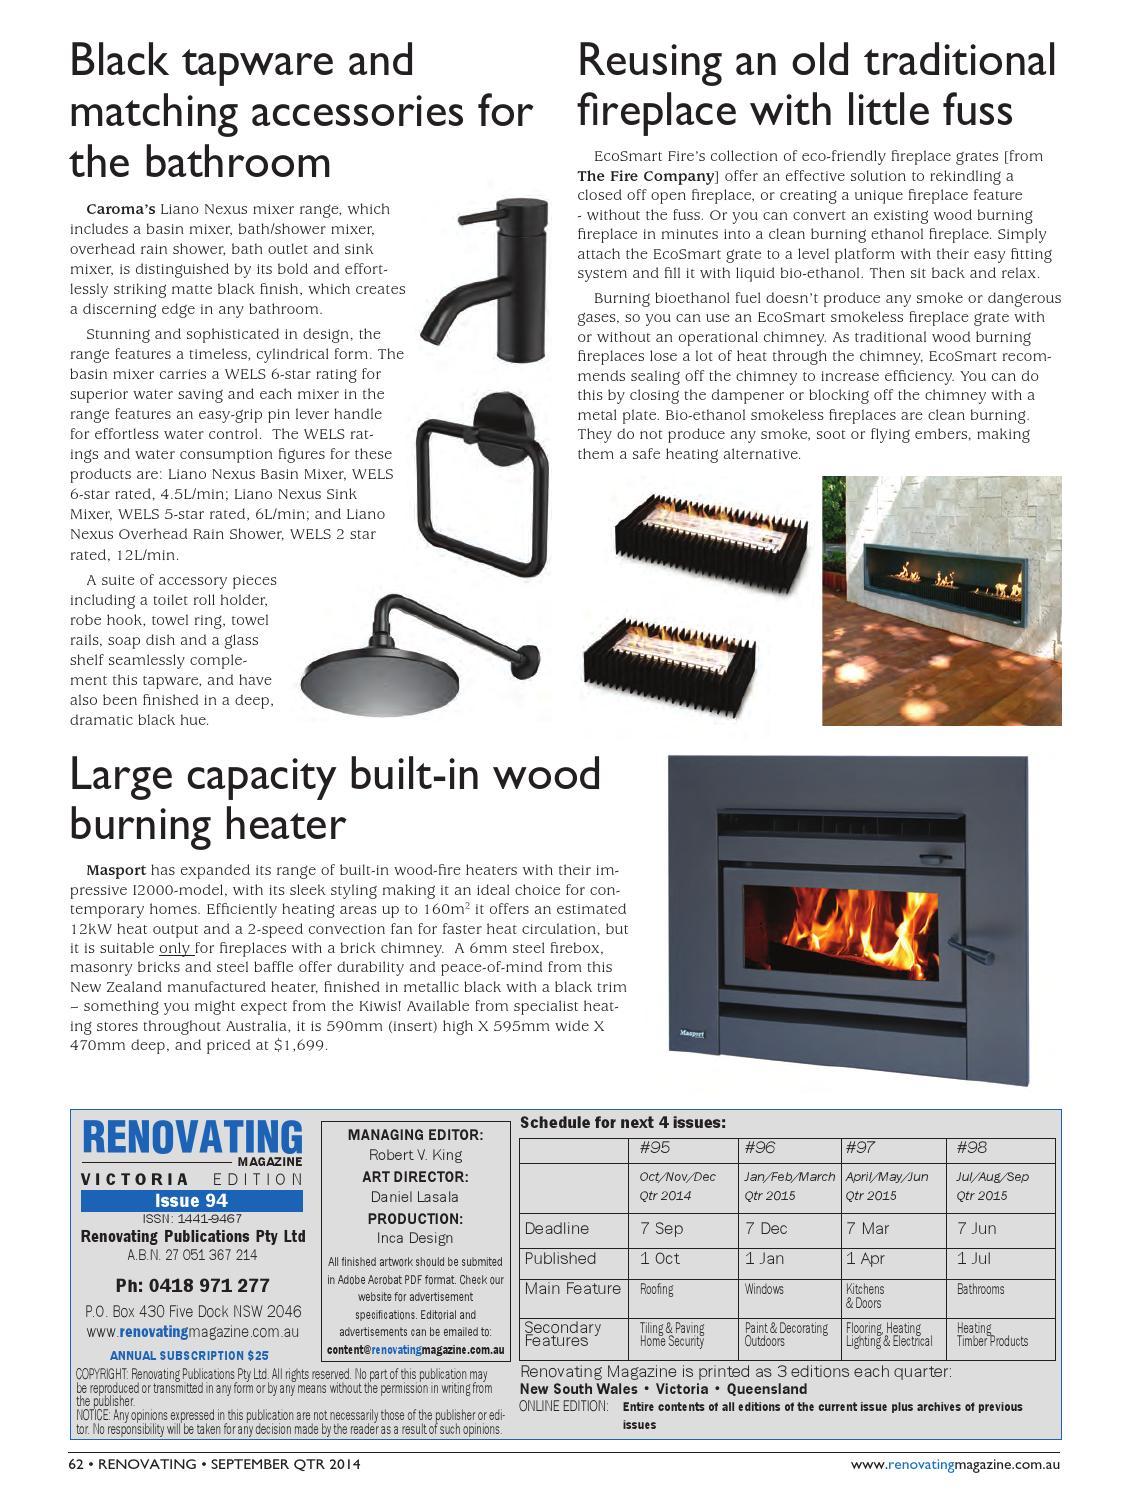 foto de Issue 94 Victoria Edition.pdf by RenovatingMagazine - issuu